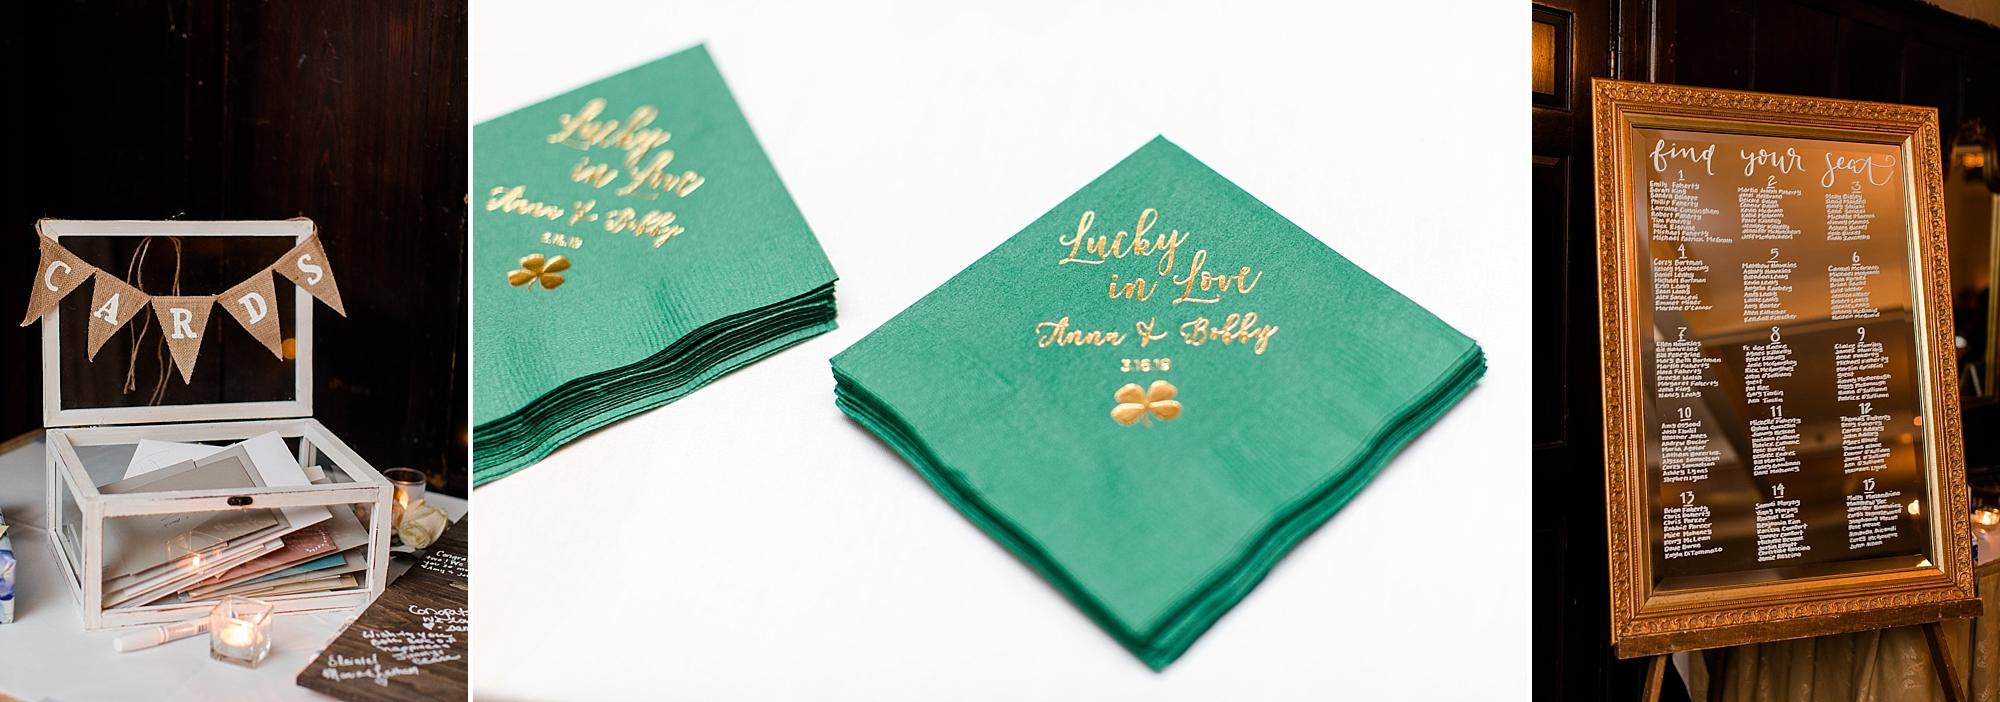 eisleyimages-irish-wedding-boston-seaport_0084.jpg